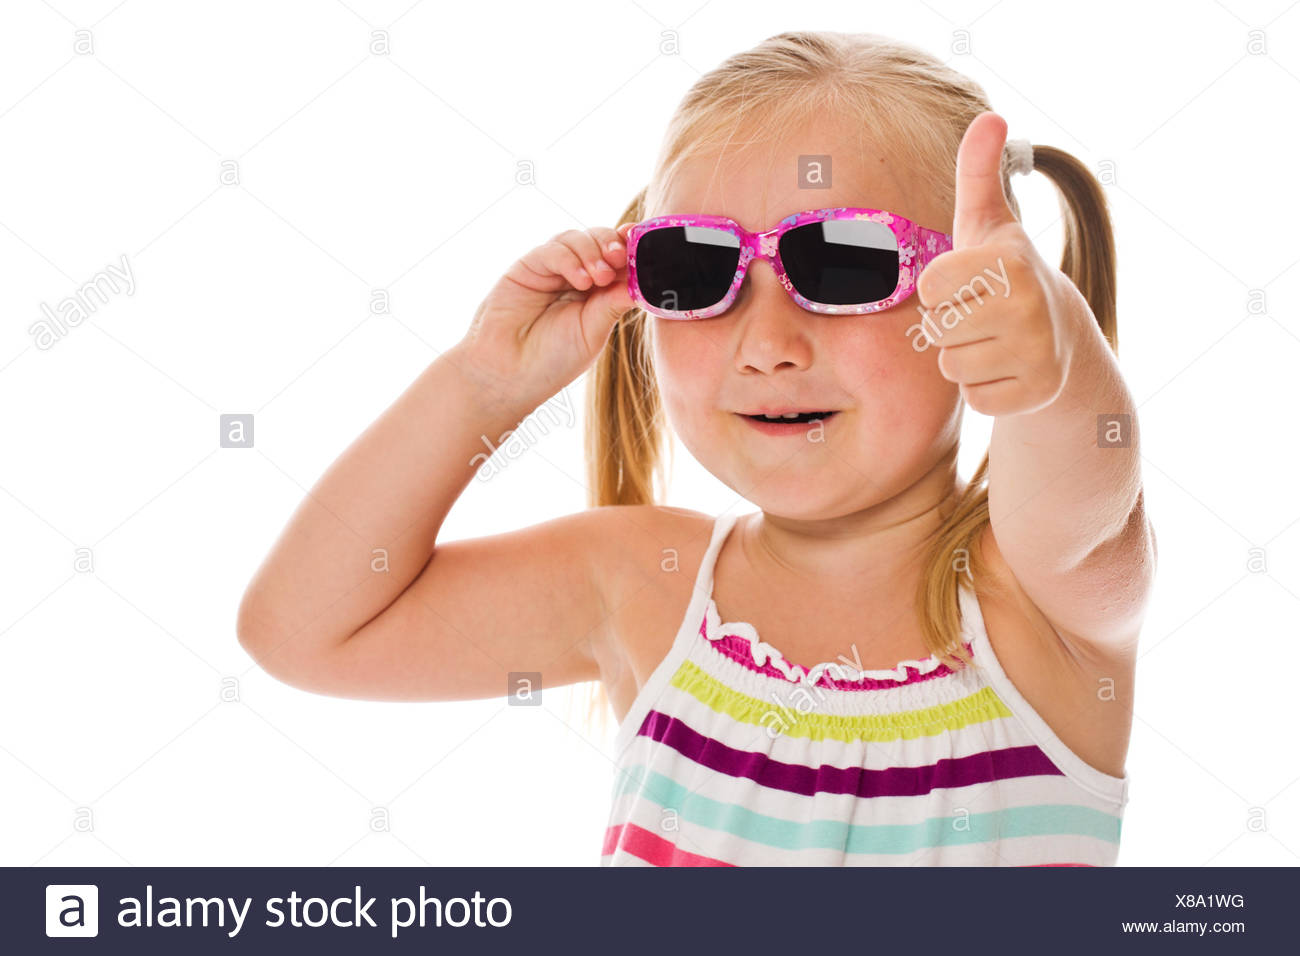 a01bdc8b7bb2 summer, summerly, studio, child, sunglasses, sunglass, girl, girls, humans,